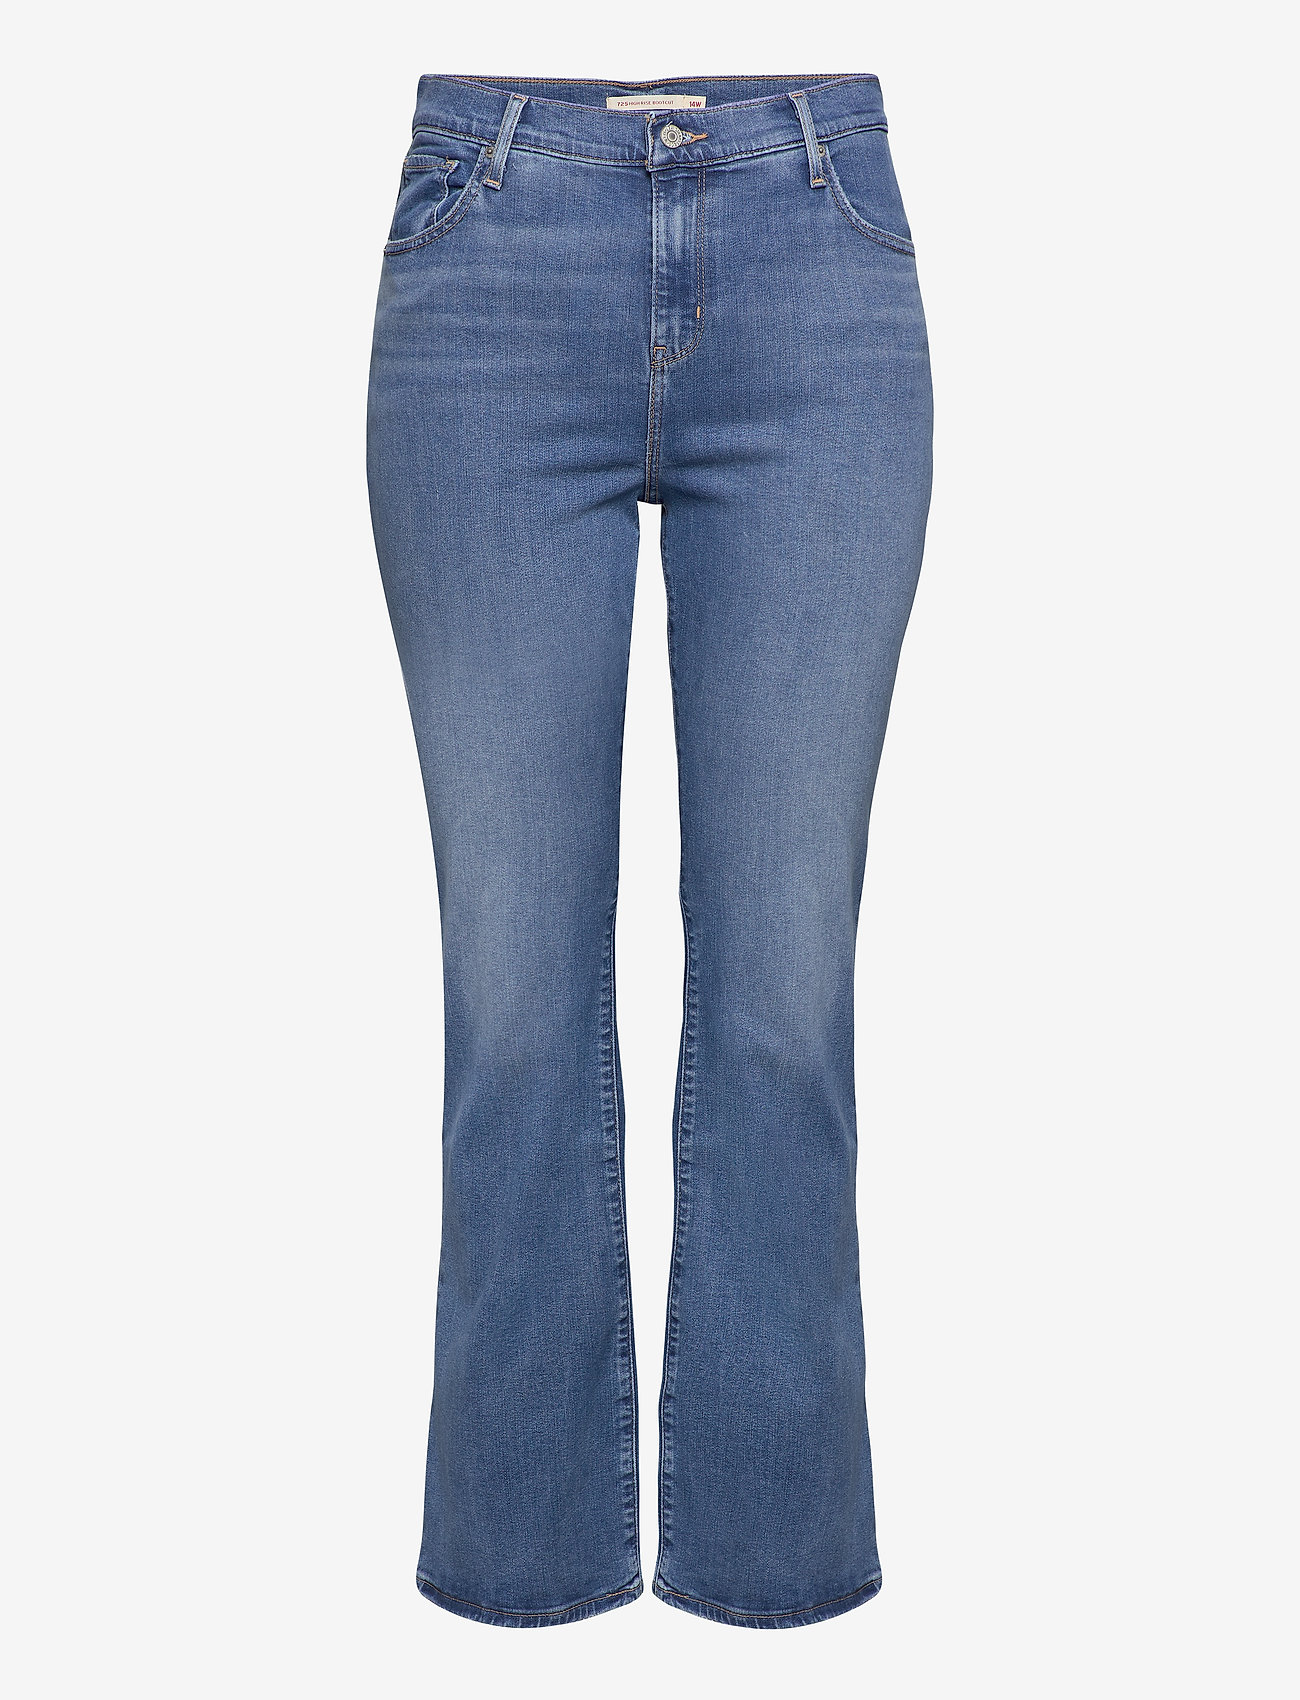 Levi's Plus Size - 725 PL HR BOOTCUT RIO RAVE PLU - bootcut jeans - light indigo - worn in - 0